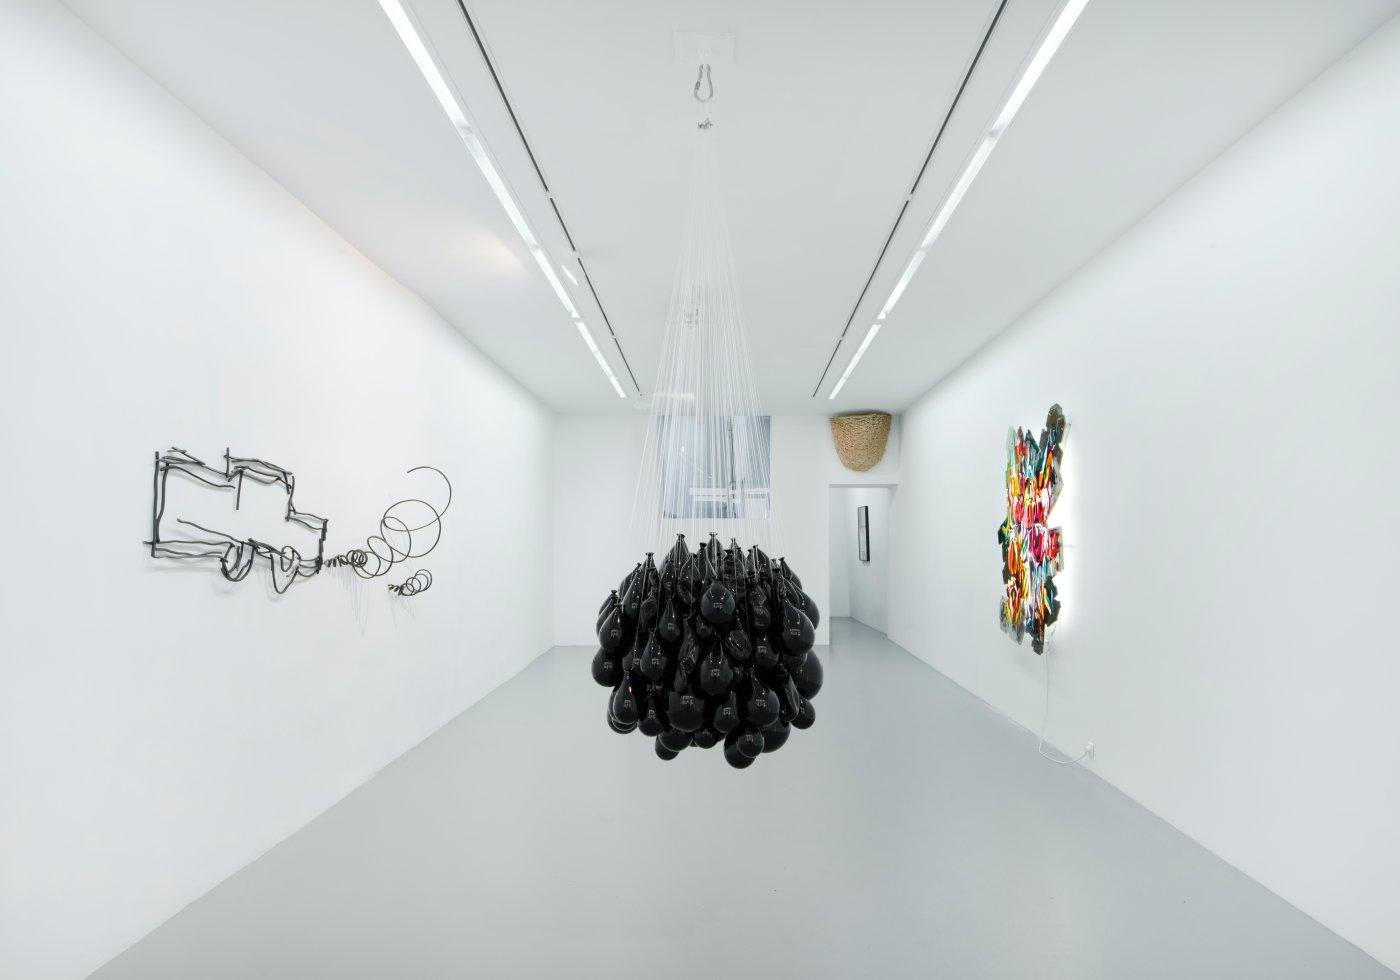 kamel mennour FIAC in the galleries 9